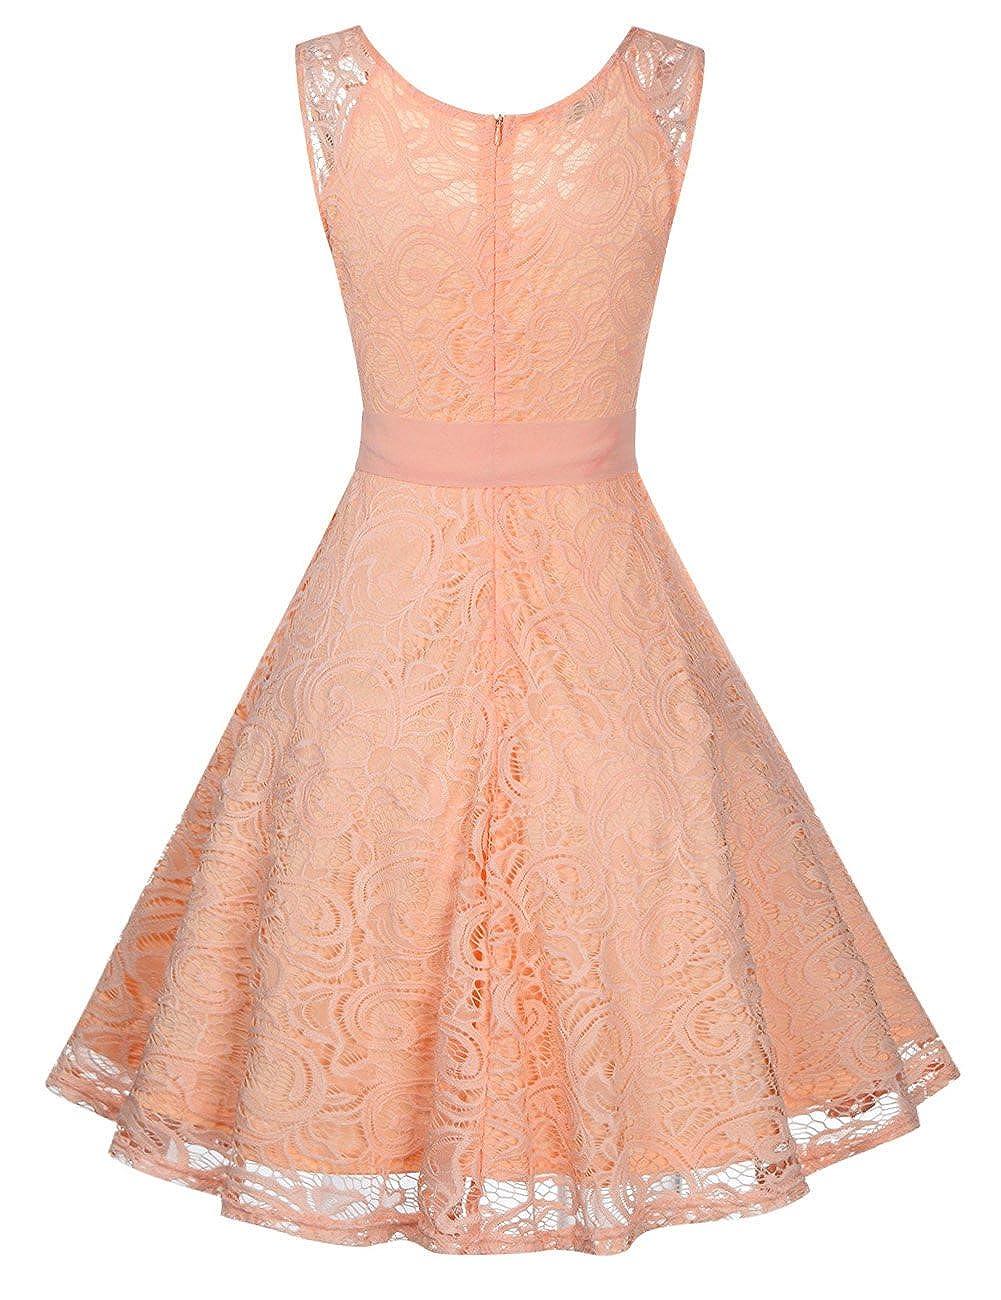 KOJOOIN Women Vintage Bridesmaid Dress Lace Dress Wedding Evening Cocktail Prom Dresses: Amazon.co.uk: Clothing